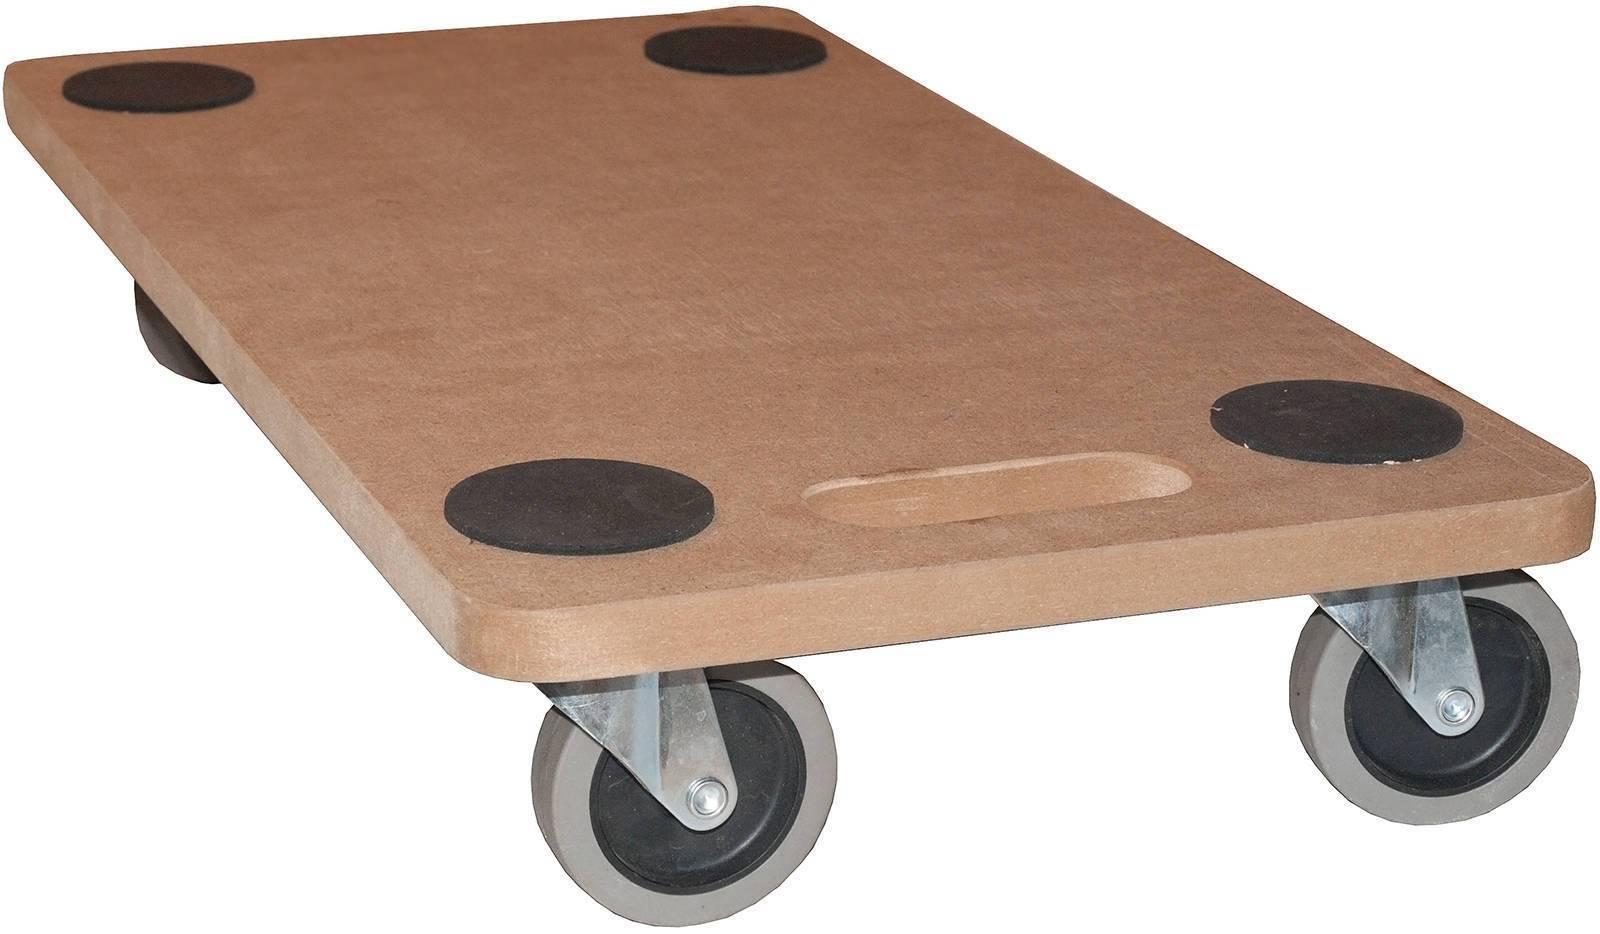 mobelroller rollbrett transportroller mdf 250 kg hund mobel roller mit softrolle